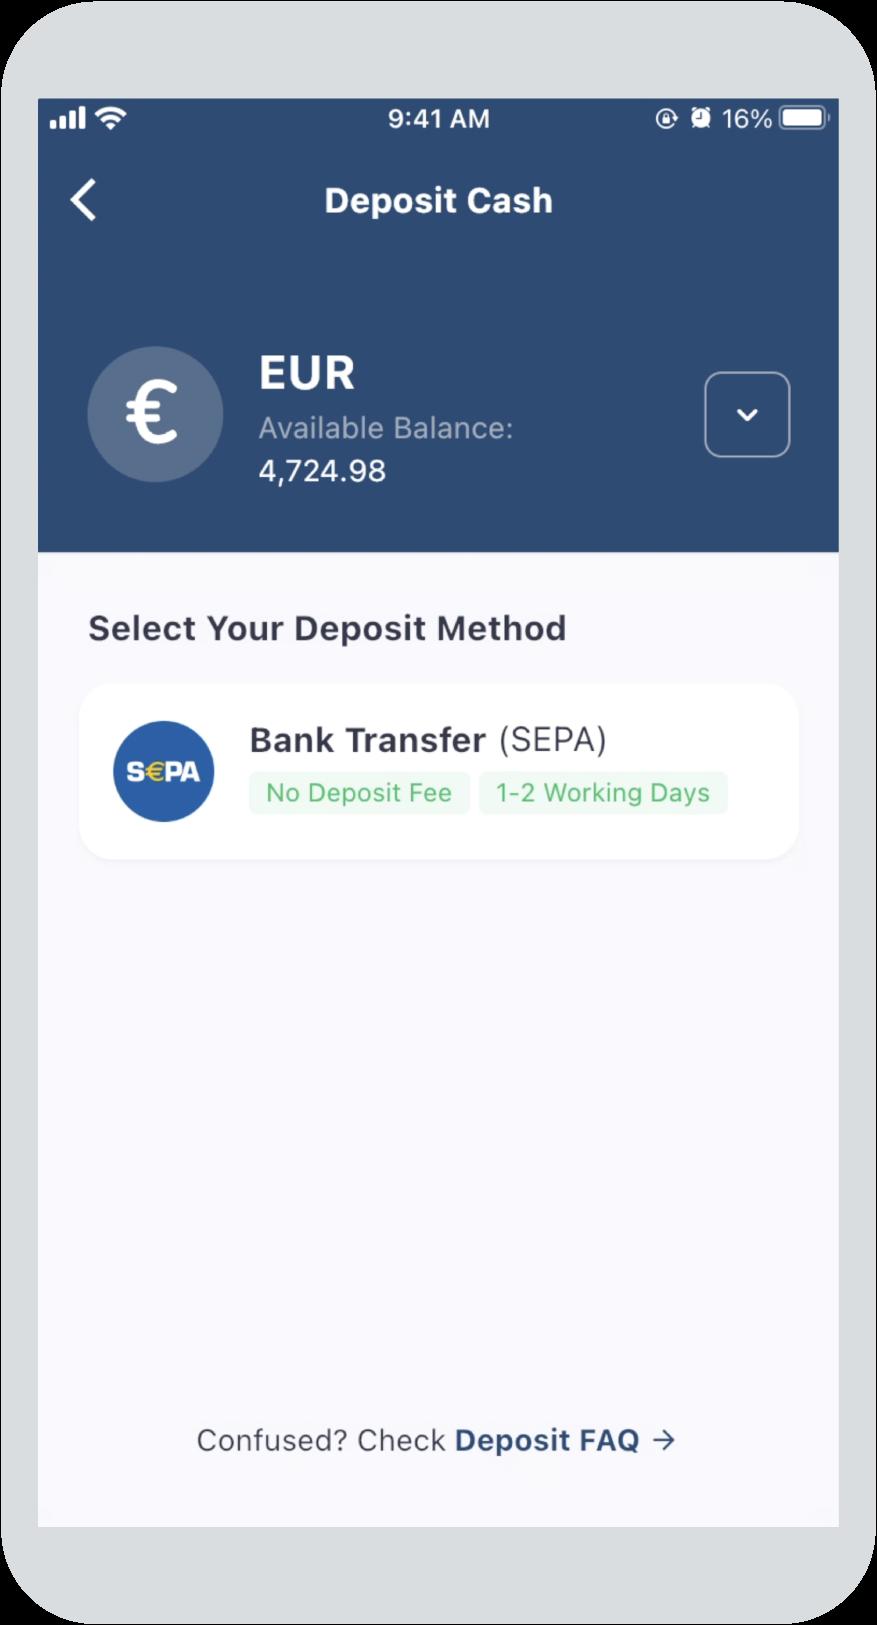 Step 2: Select Bank Transfer